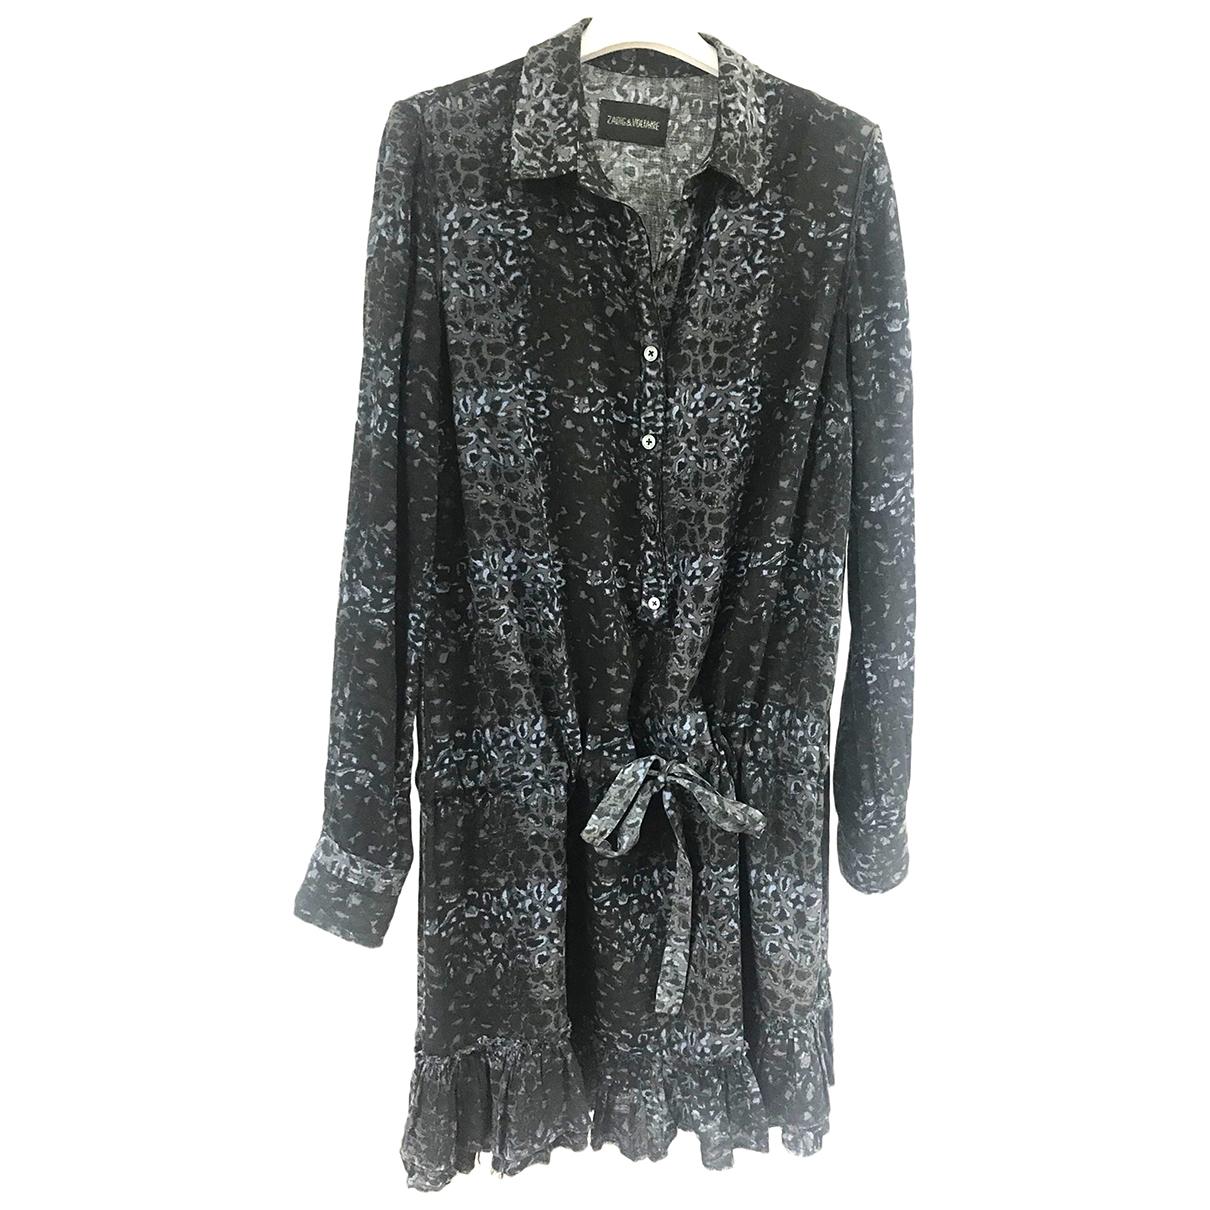 Zadig & Voltaire \N Anthracite Cotton dress for Women S International